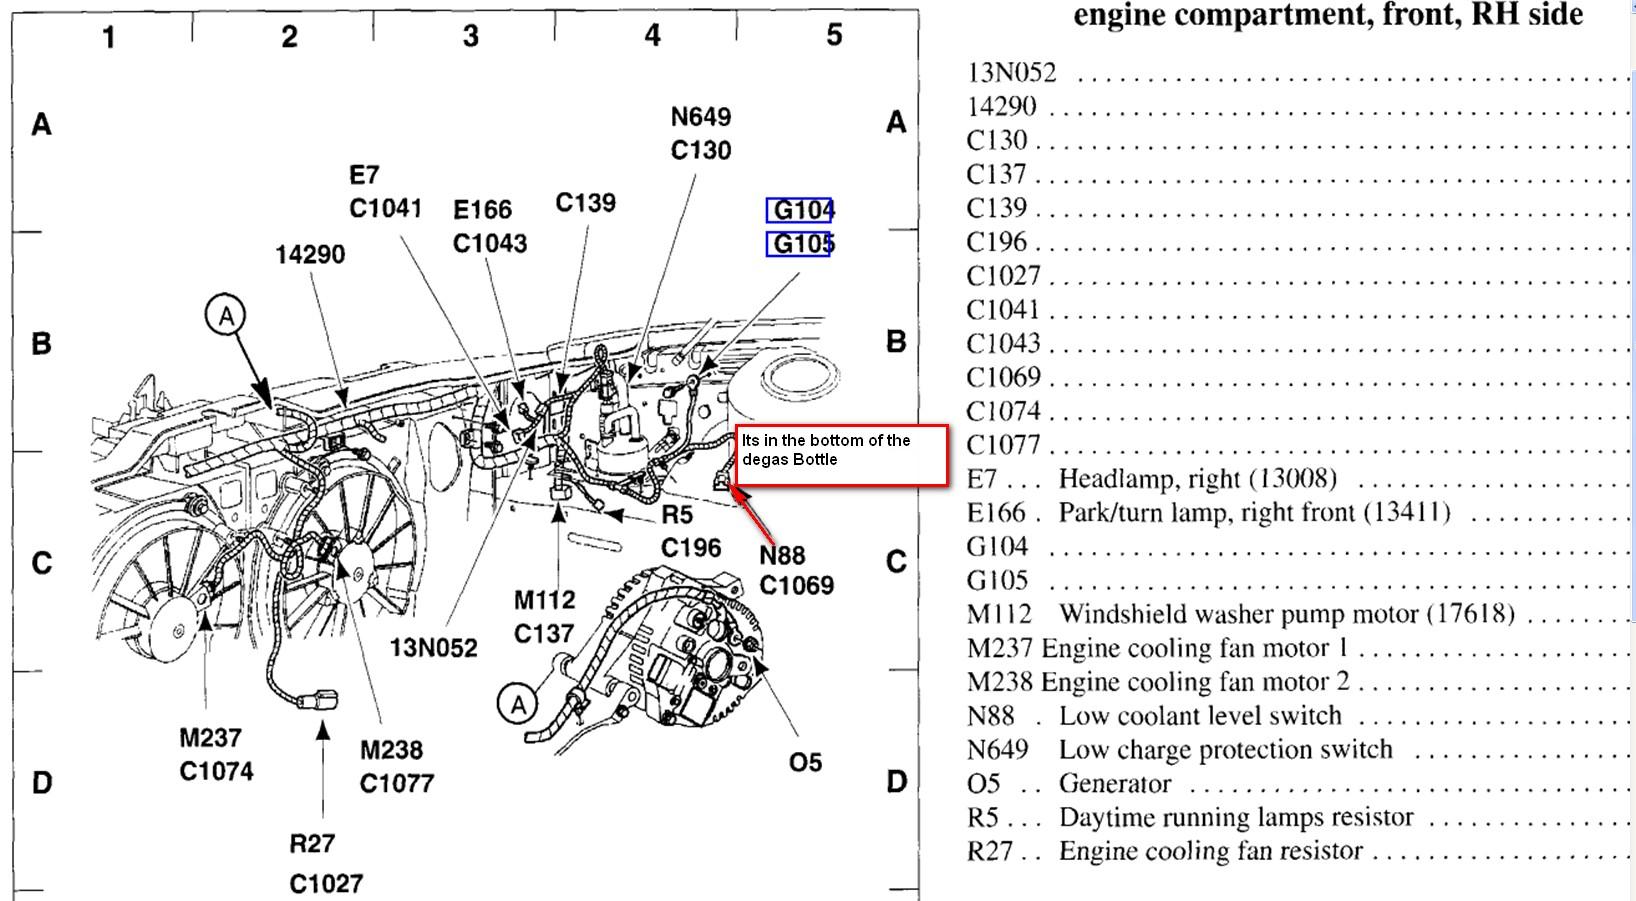 2002 Mercury Sable  Coolant Warning Light Came On